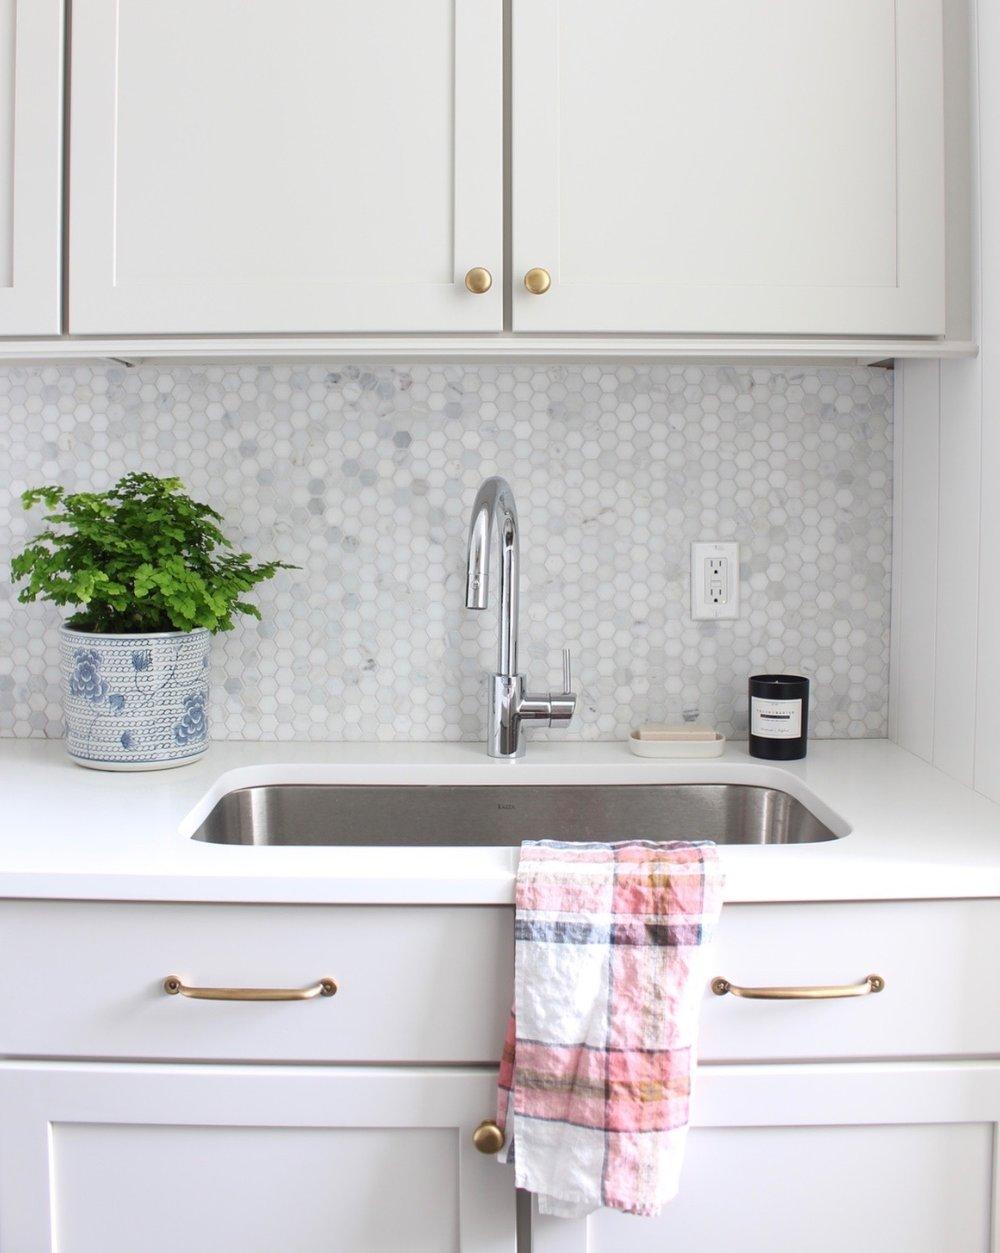 Laundry sink.jpg